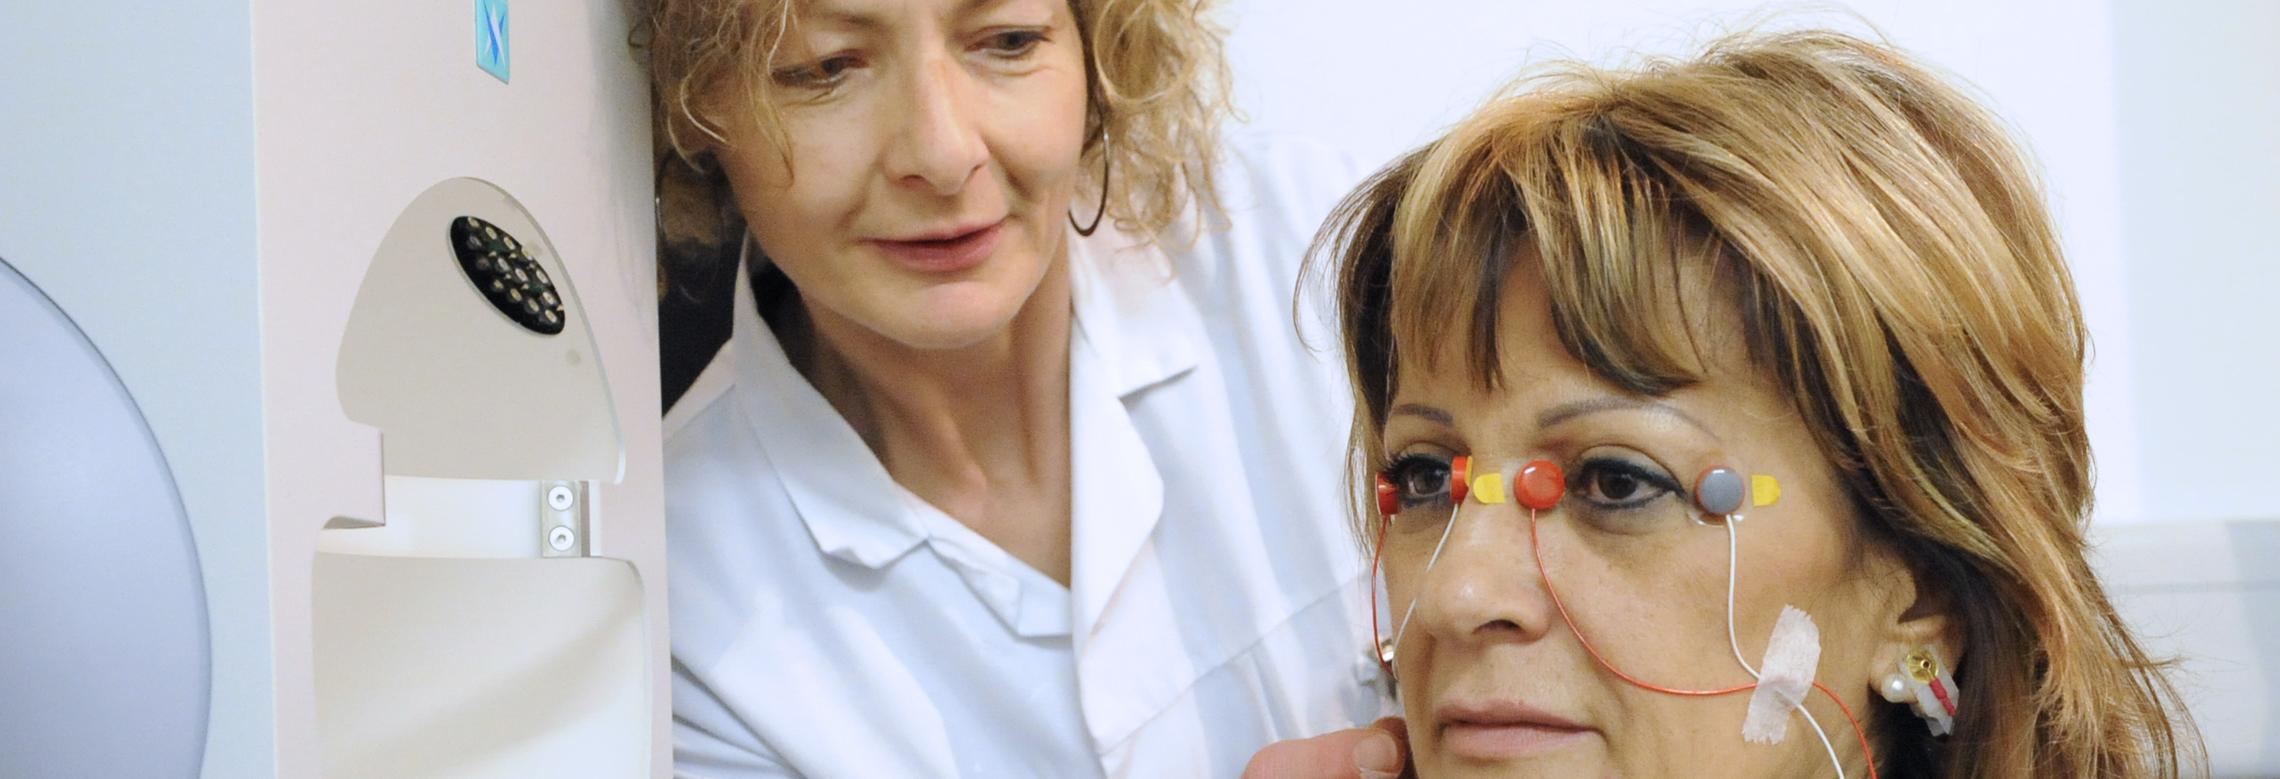 Examen de neuro-ophtalmologie